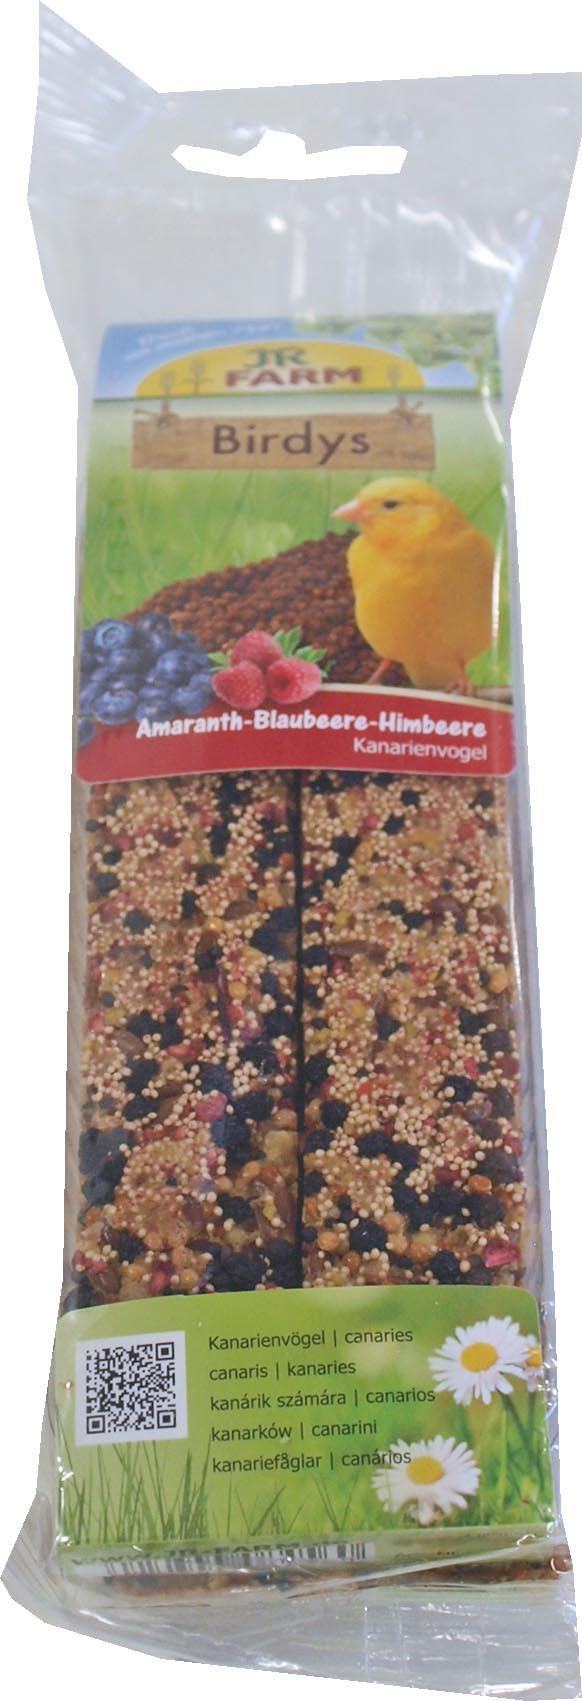 JR Farm Birdy kanarie amarant/blauwbes/ framboos 130 gr